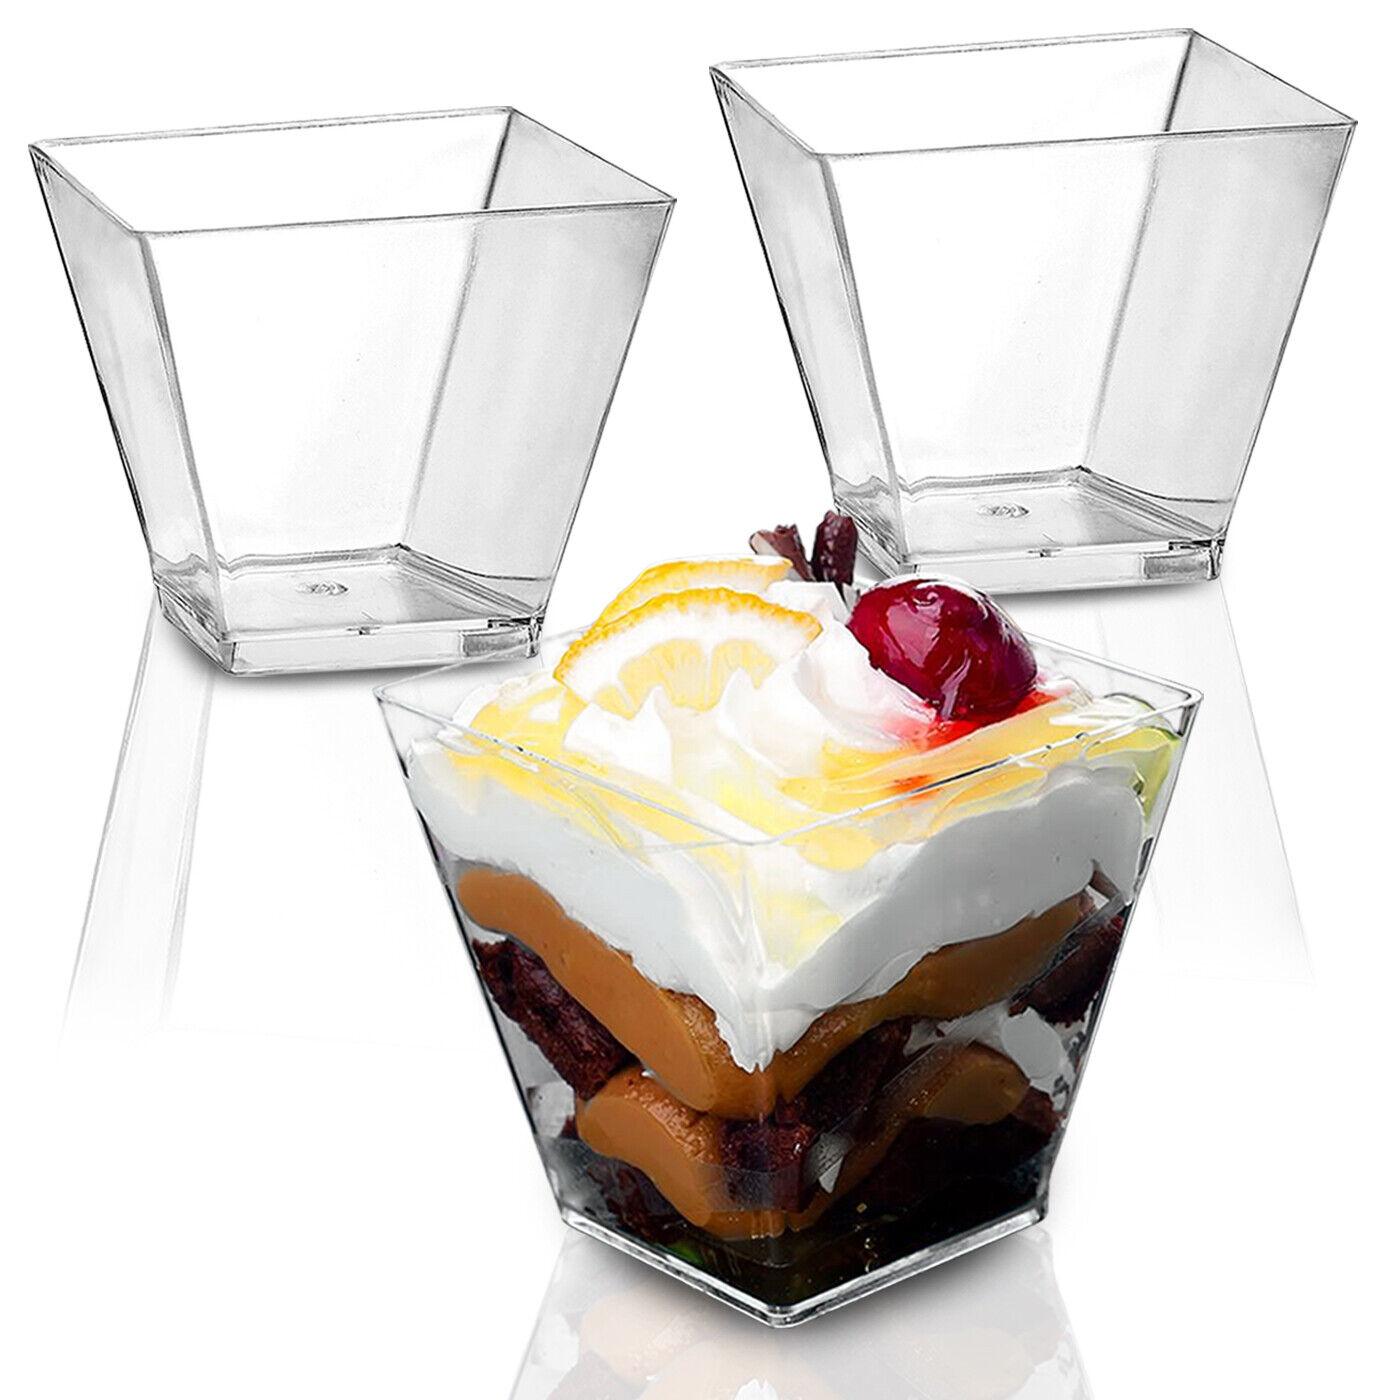 100Pcs 2oz Square Dessert Mini Cups Plastic Cube Clear Sample Shot Party Decor